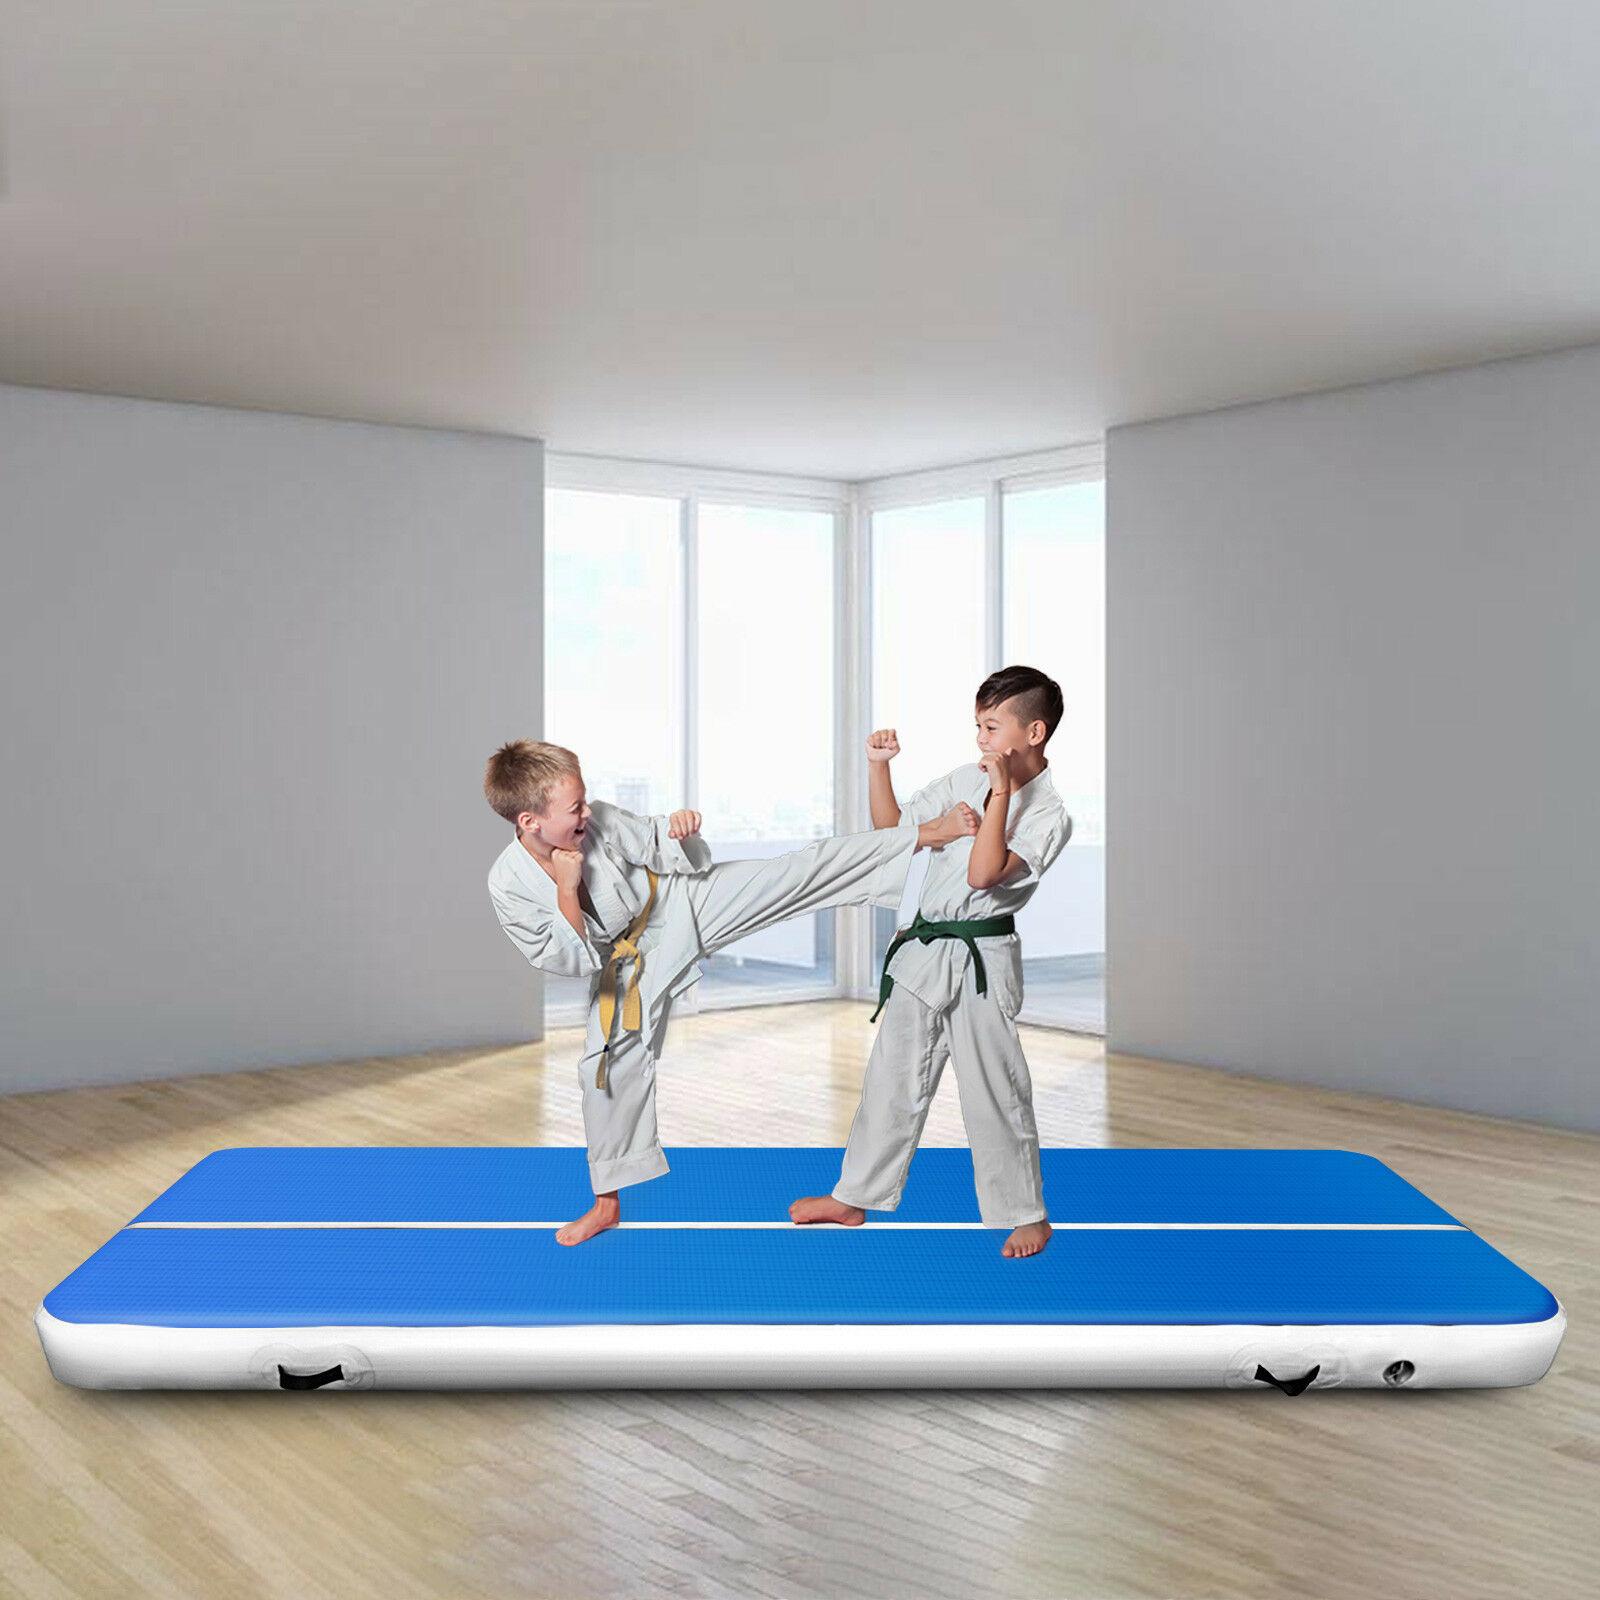 3M Inflatable Track  Gym Tumble Airtrack Floor Yoga Tumbling wrestling Yogo Electric Air Pump EU/American Warehouse Spot